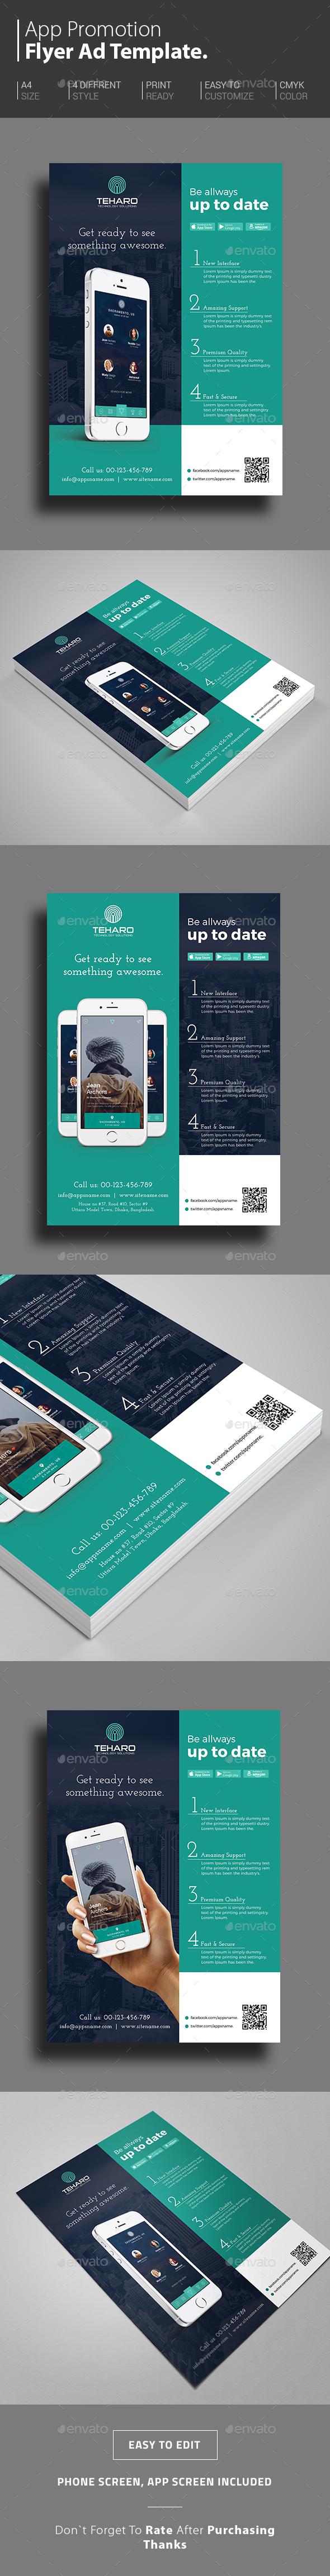 App Promotional Flyer - Commerce Flyers